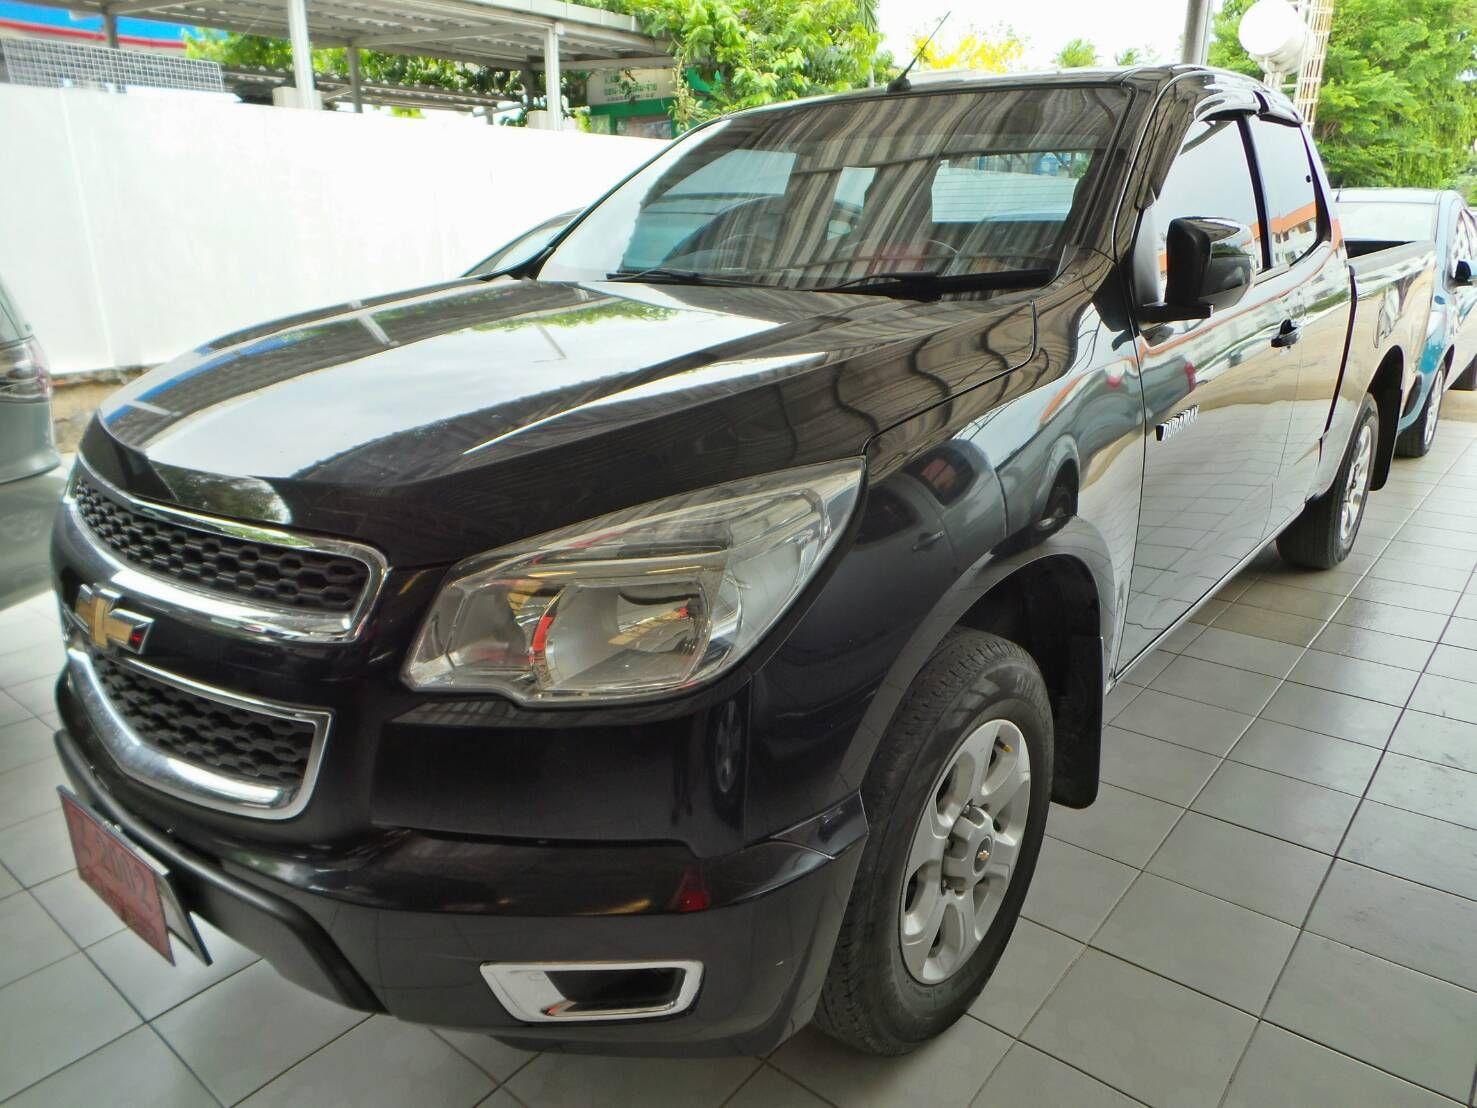 CHEVLORET Corolado 2007-2011 2.5 LT X-CAB